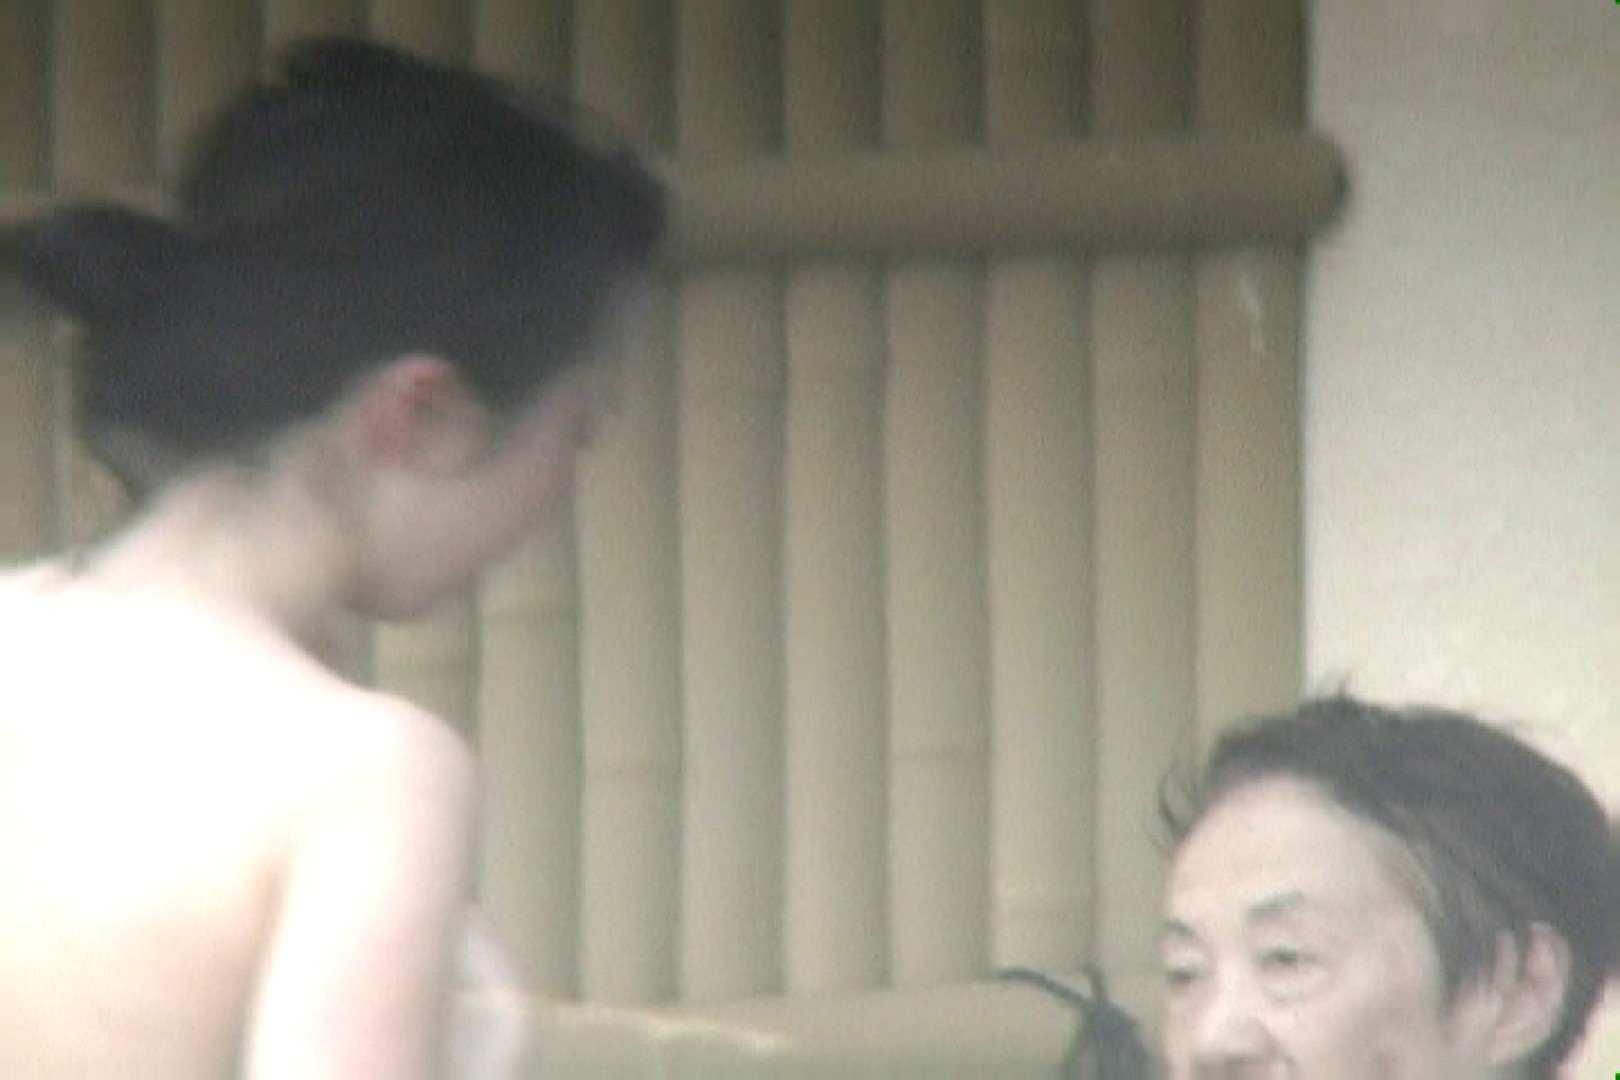 Aquaな露天風呂Vol.687 盗撮シリーズ | 露天風呂編  93PIX 13